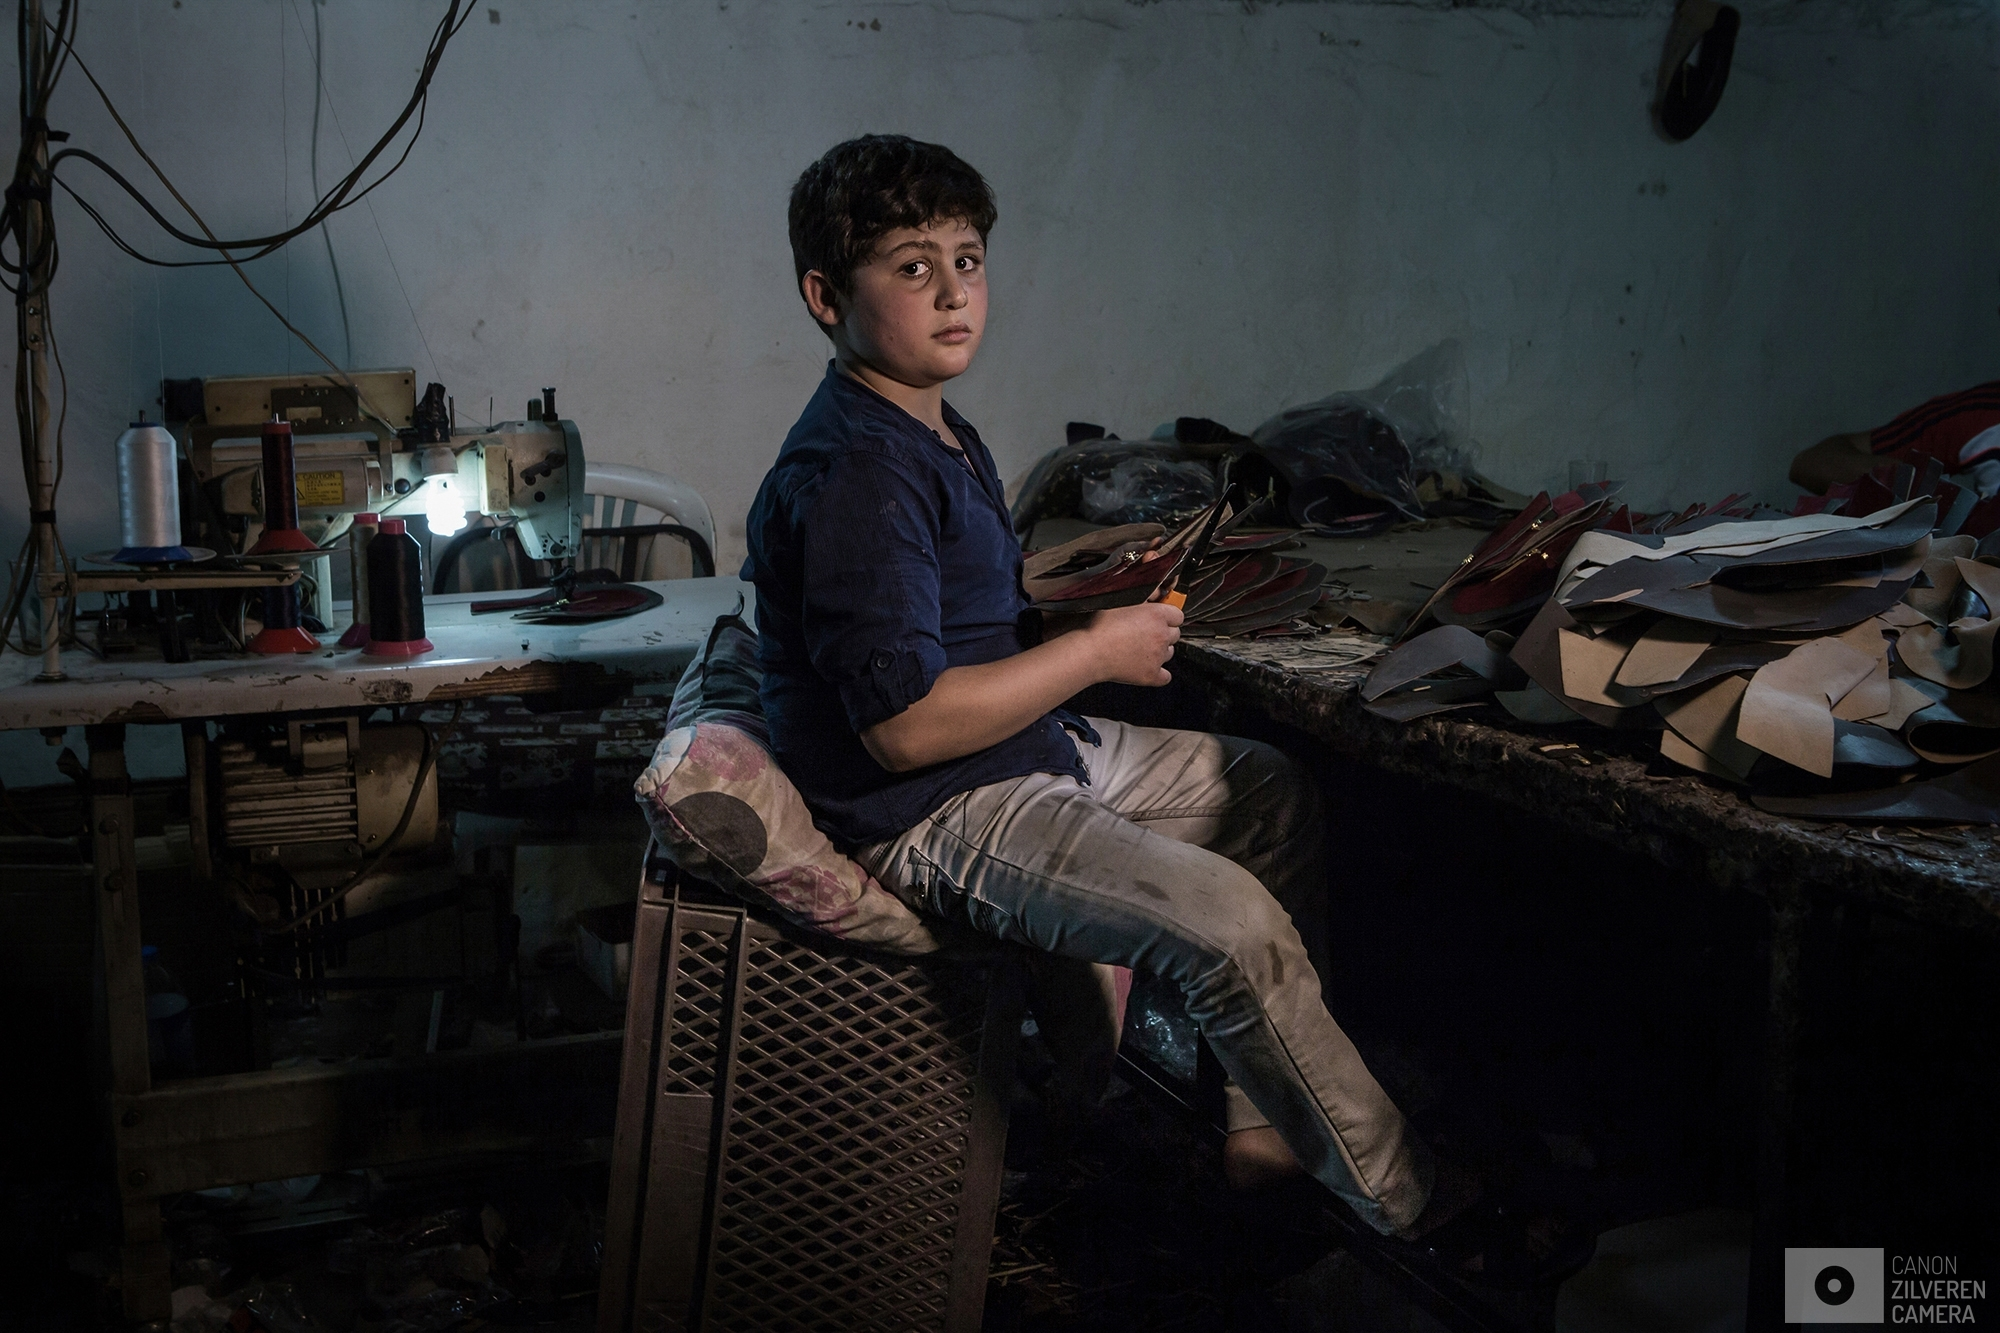 Syrian child labor